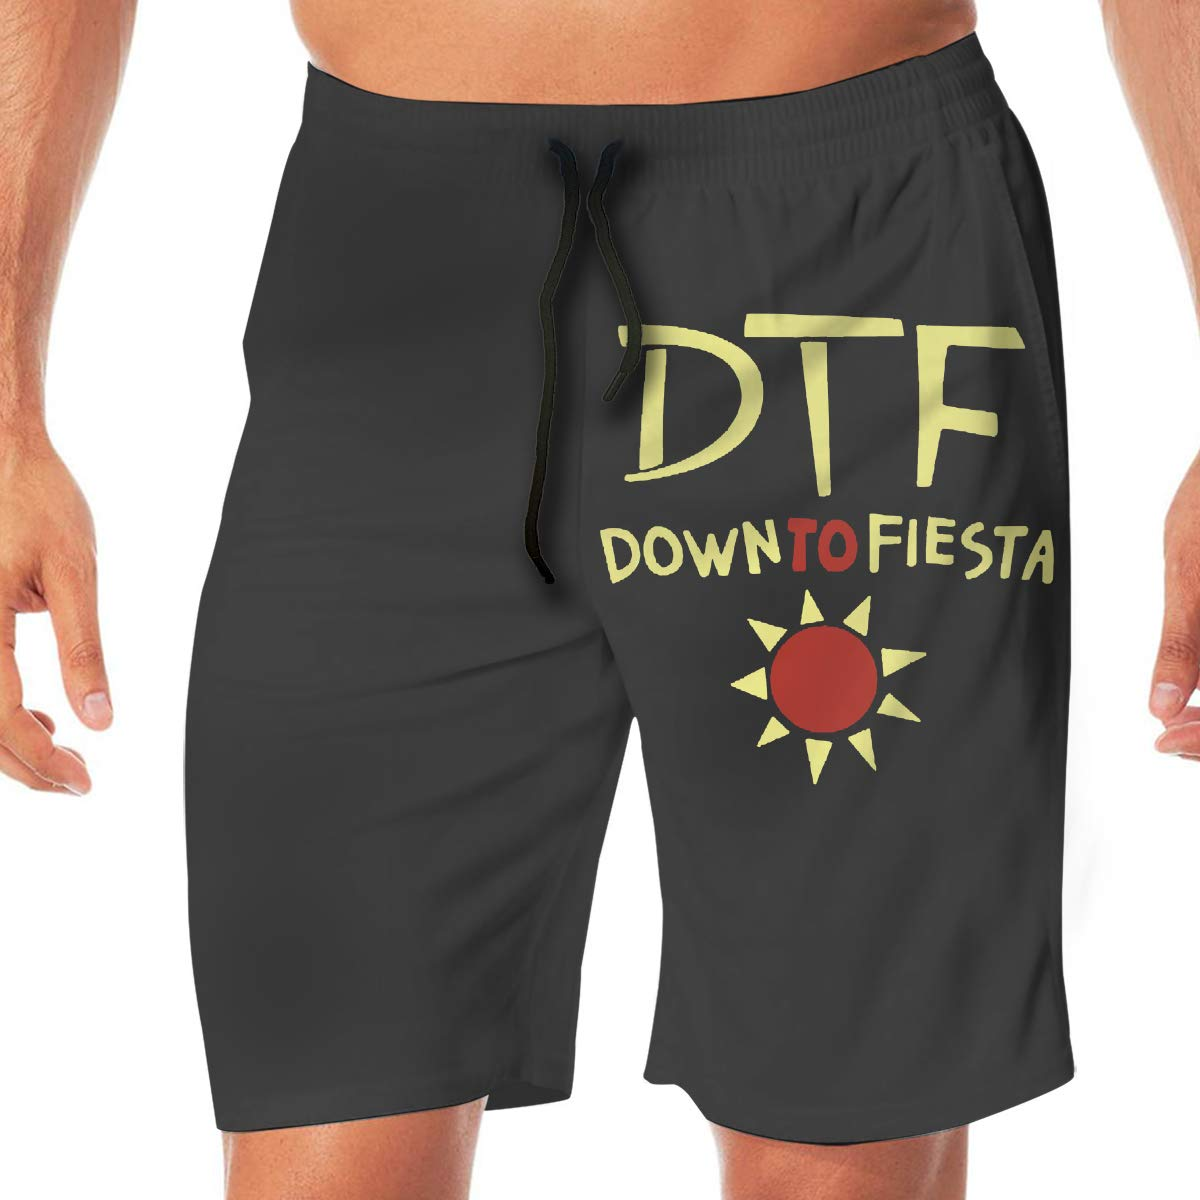 Down to Fiesta Mens Beach Shorts Casual Shorts Swim Trunks